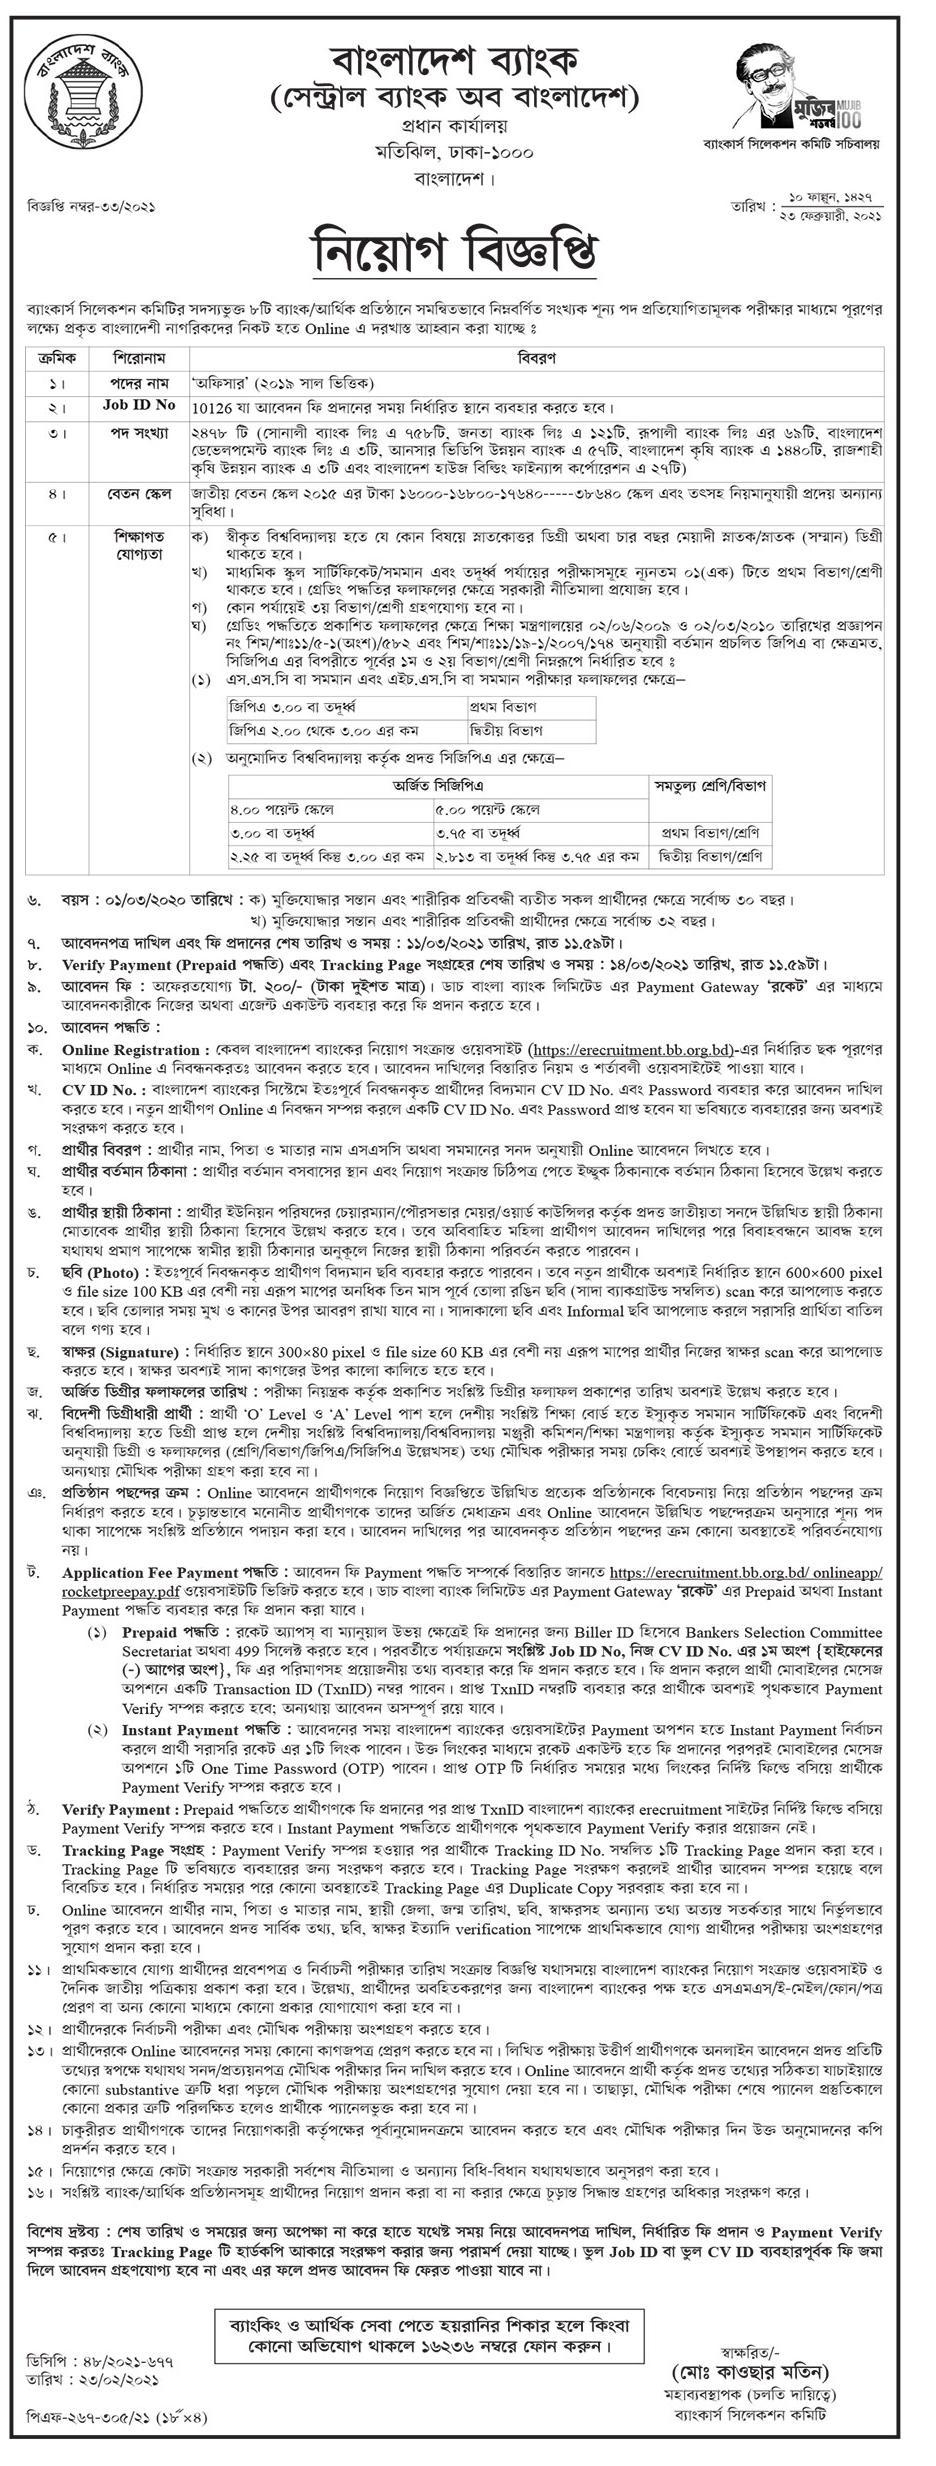 Rupali Bank job circular 2021